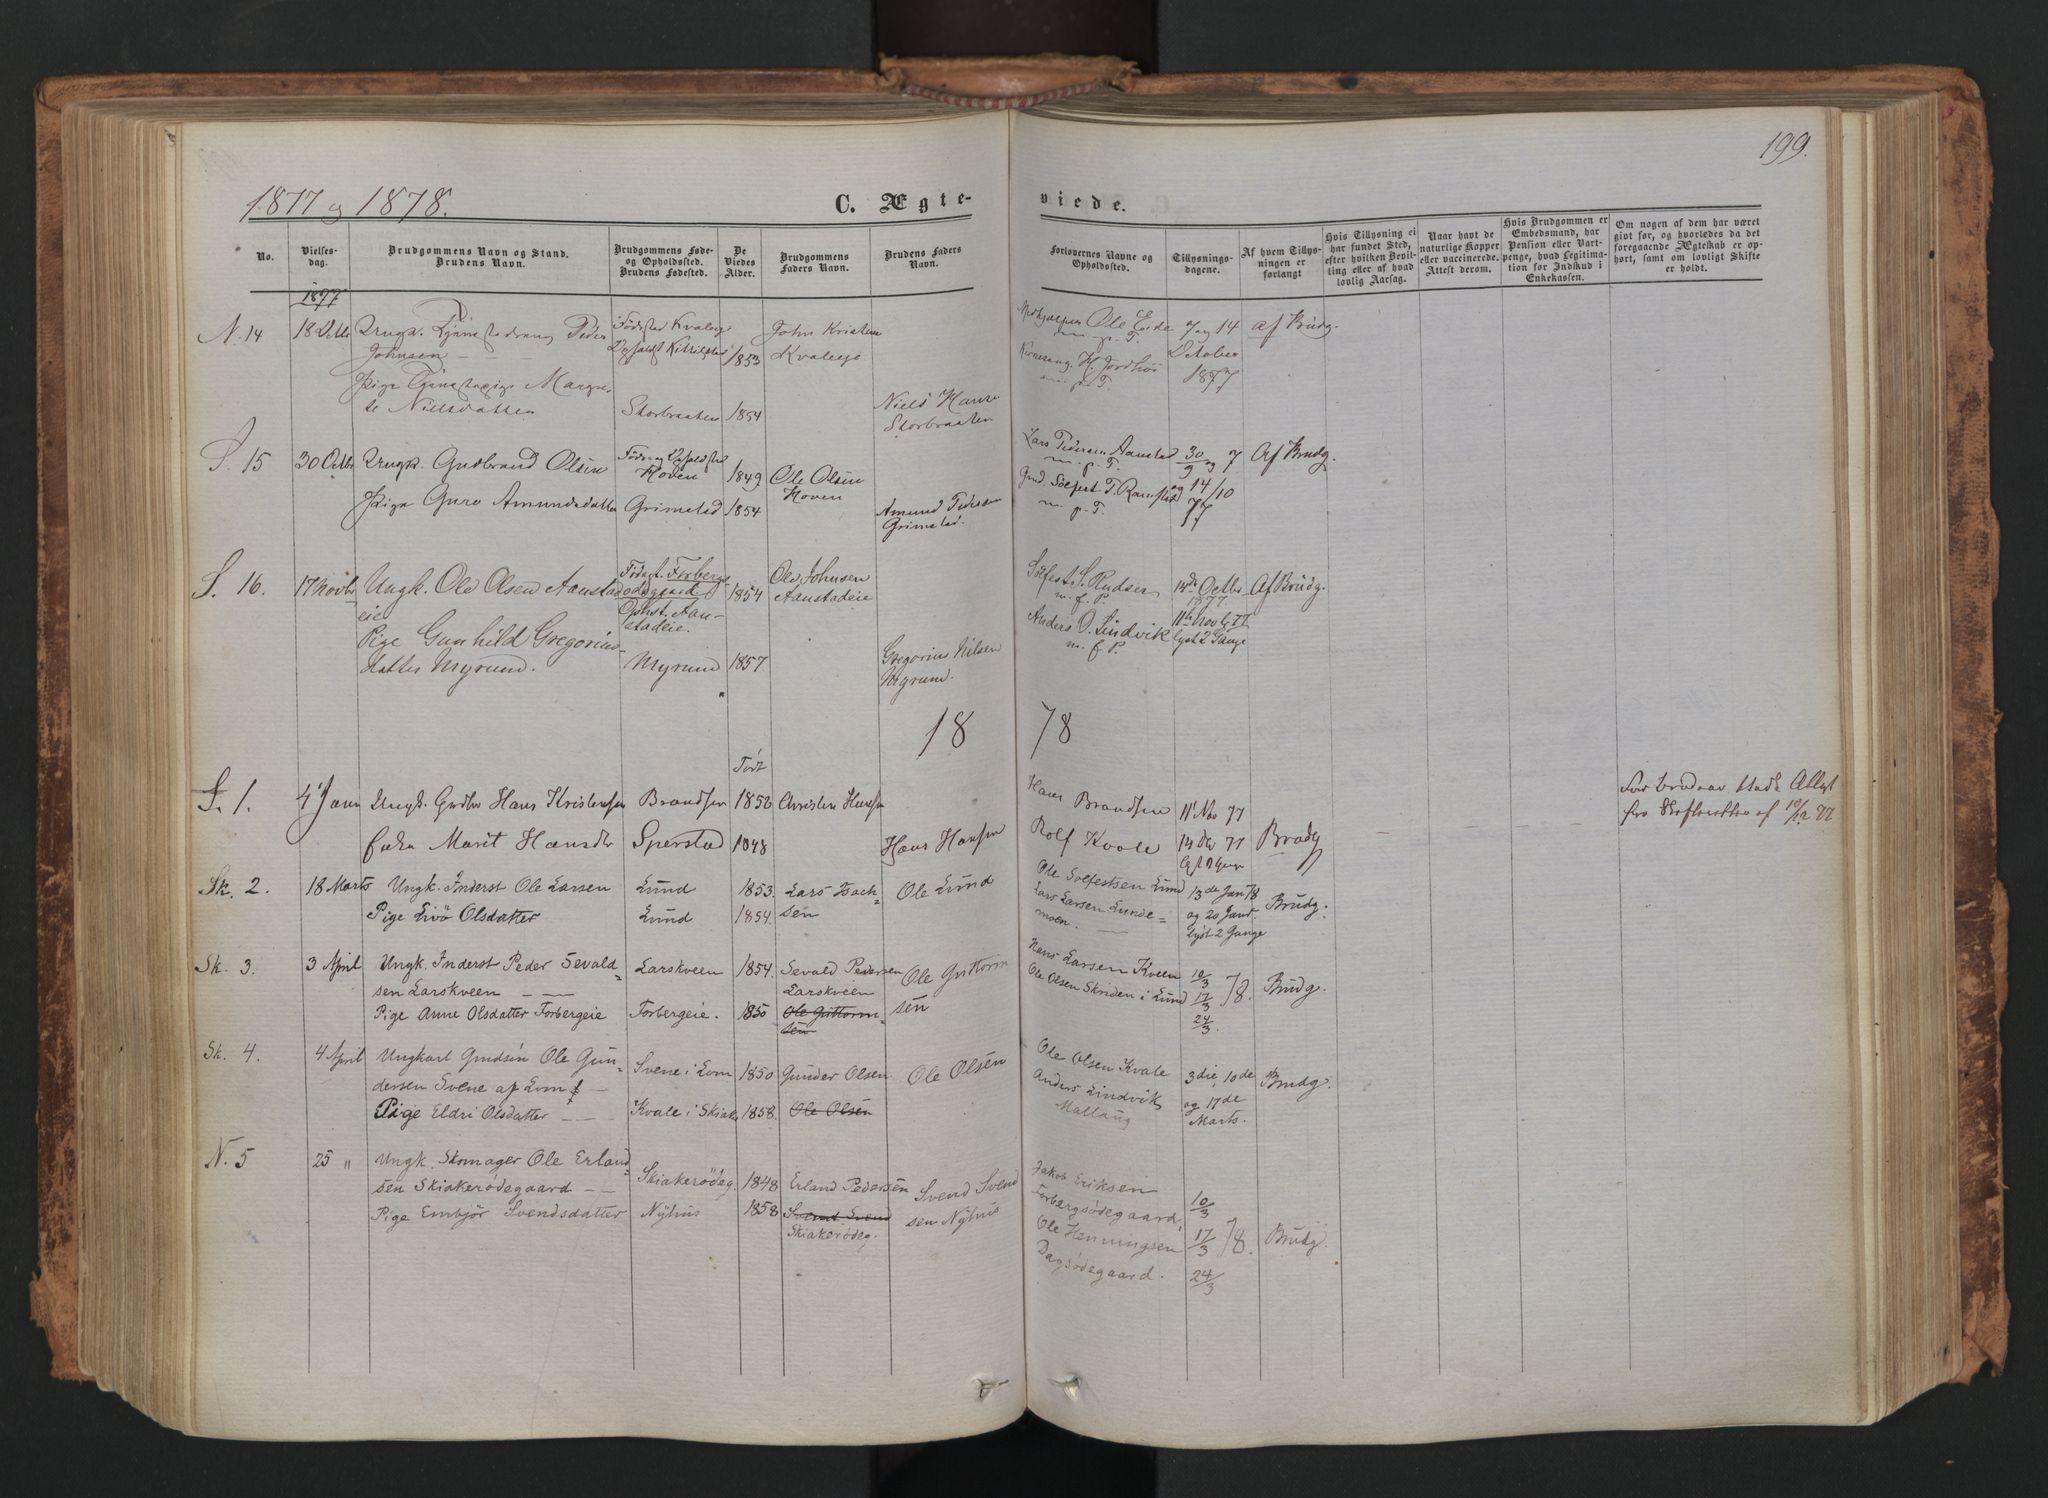 SAH, Skjåk prestekontor, Ministerialbok nr. 1, 1863-1879, s. 199